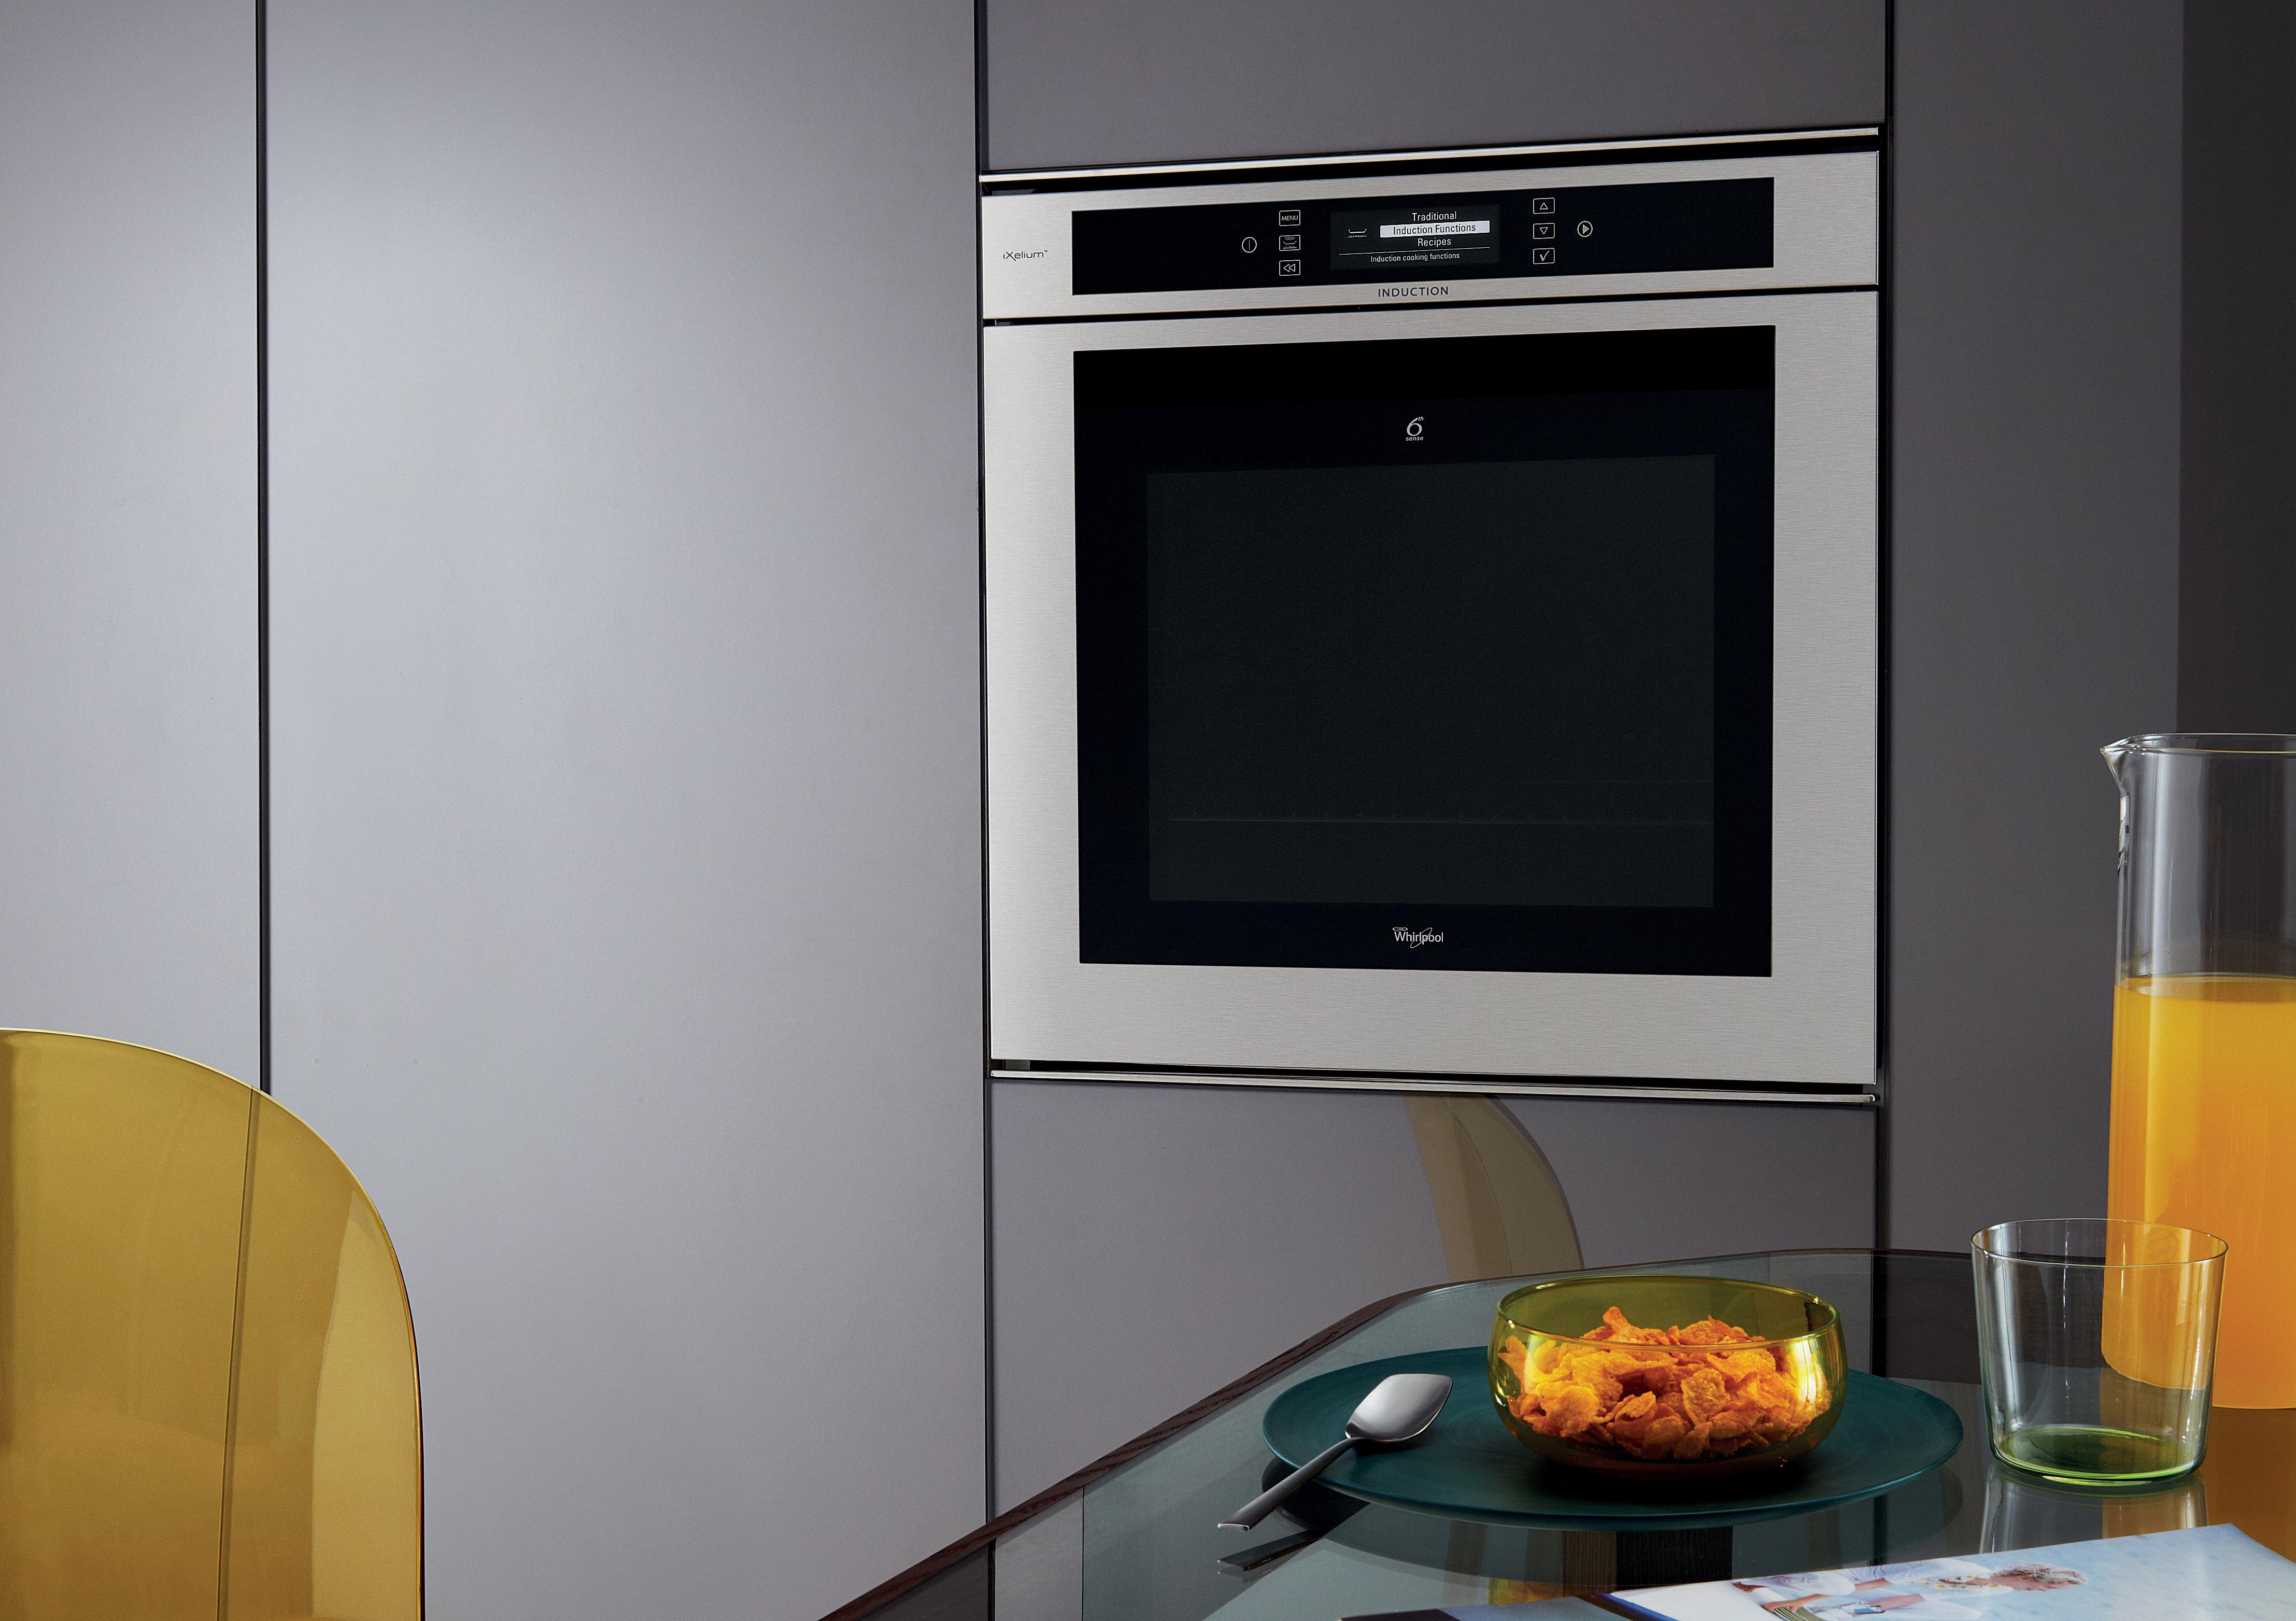 Bi induction oven ixelium 3 1 whirlpool for Forno whirlpool ixelium